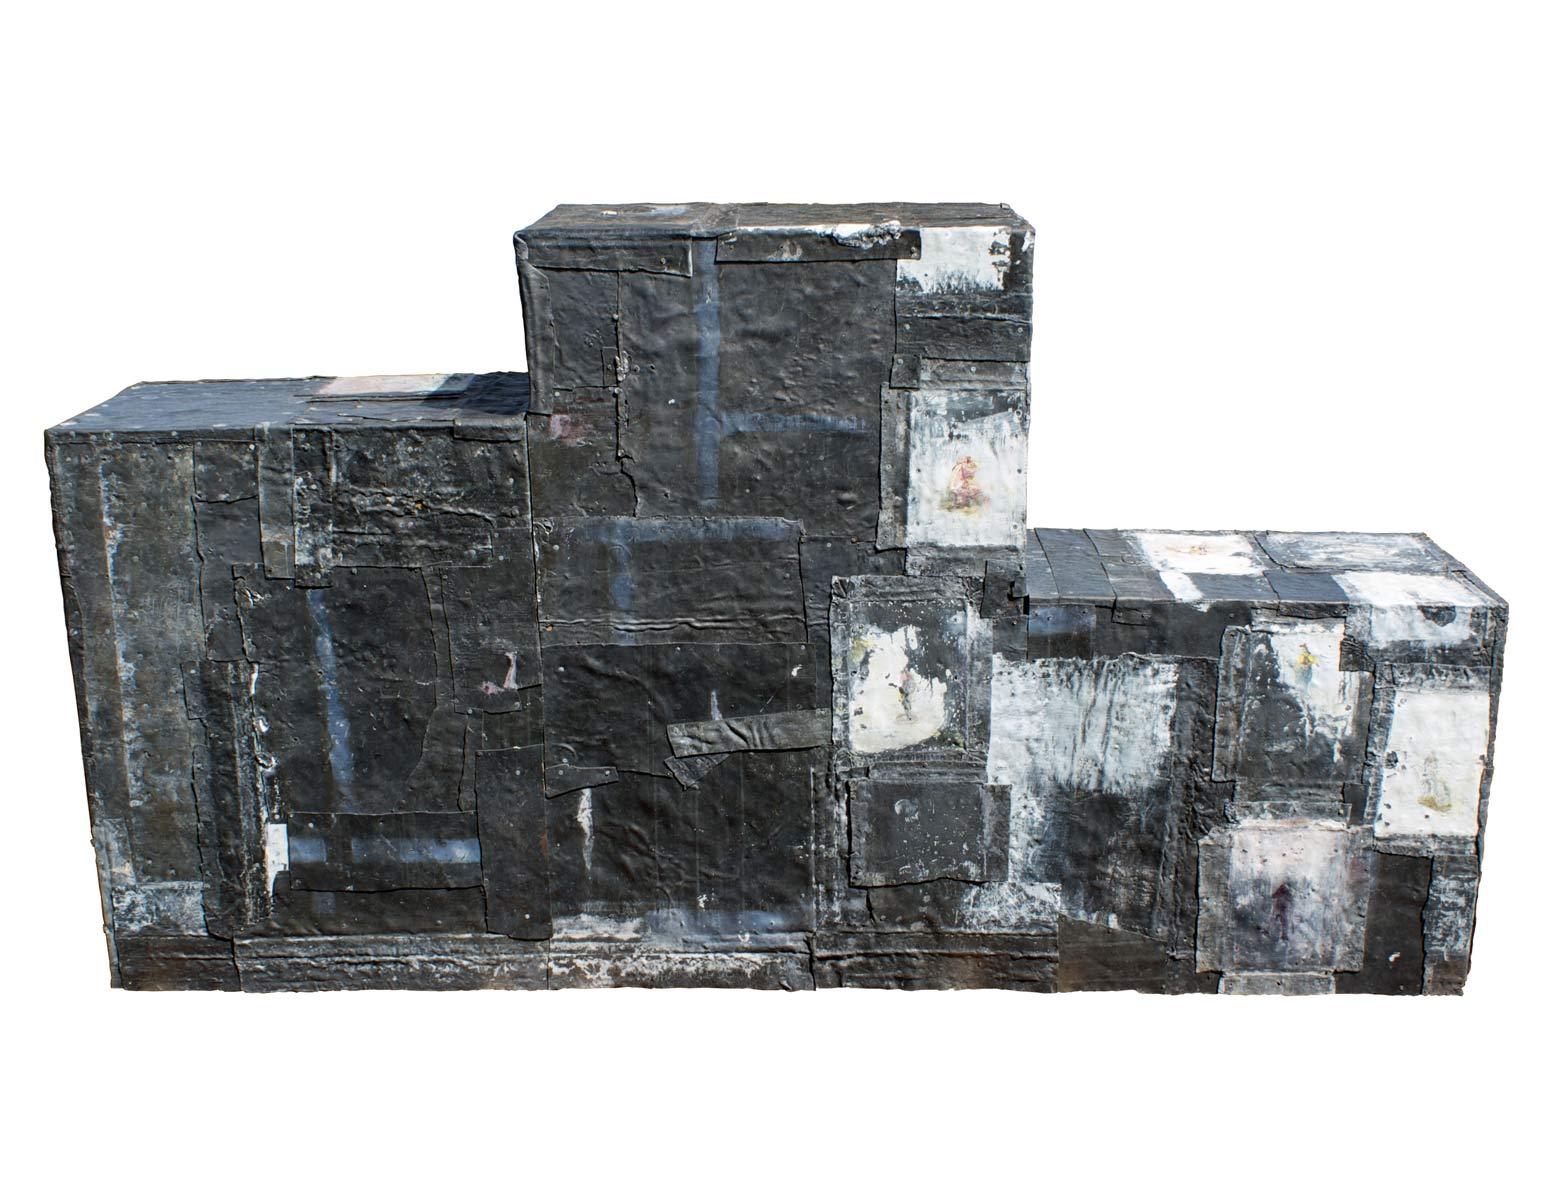 tit-165.-plomo-oleo-y-madera.-304x165x61-cm.-2009